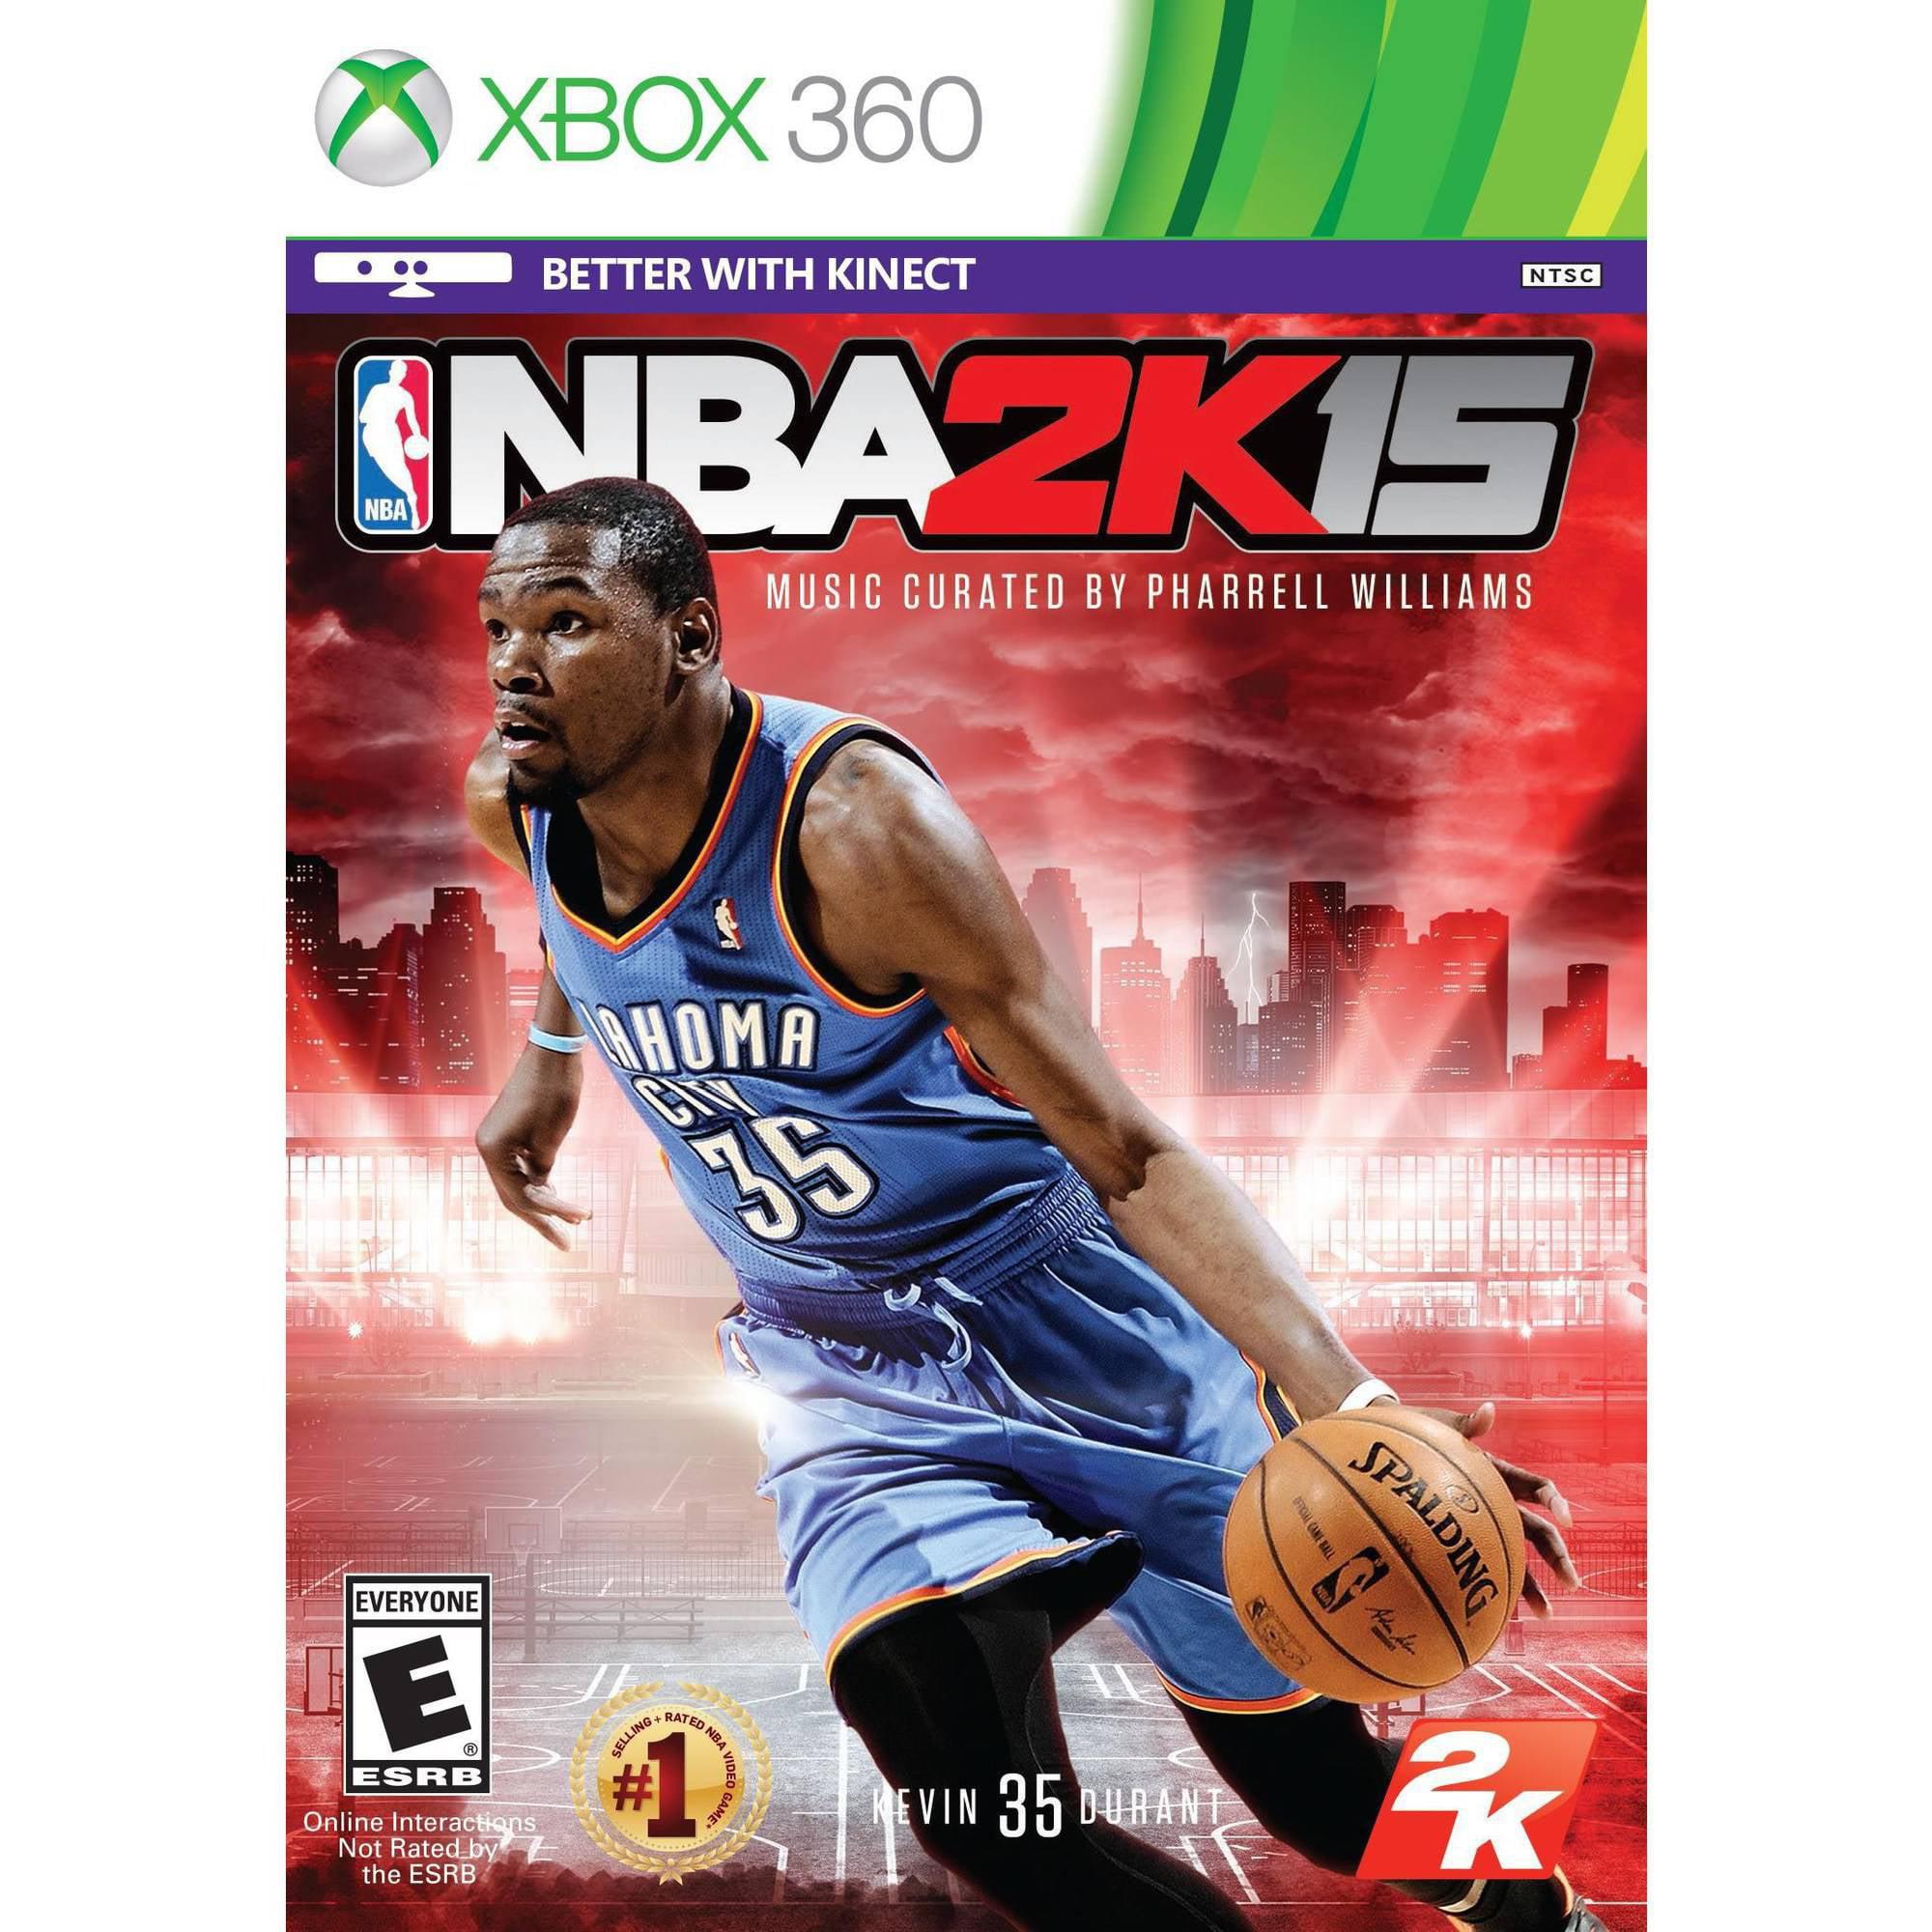 NBA 2K15 (Xbox 360) - Pre-Owned